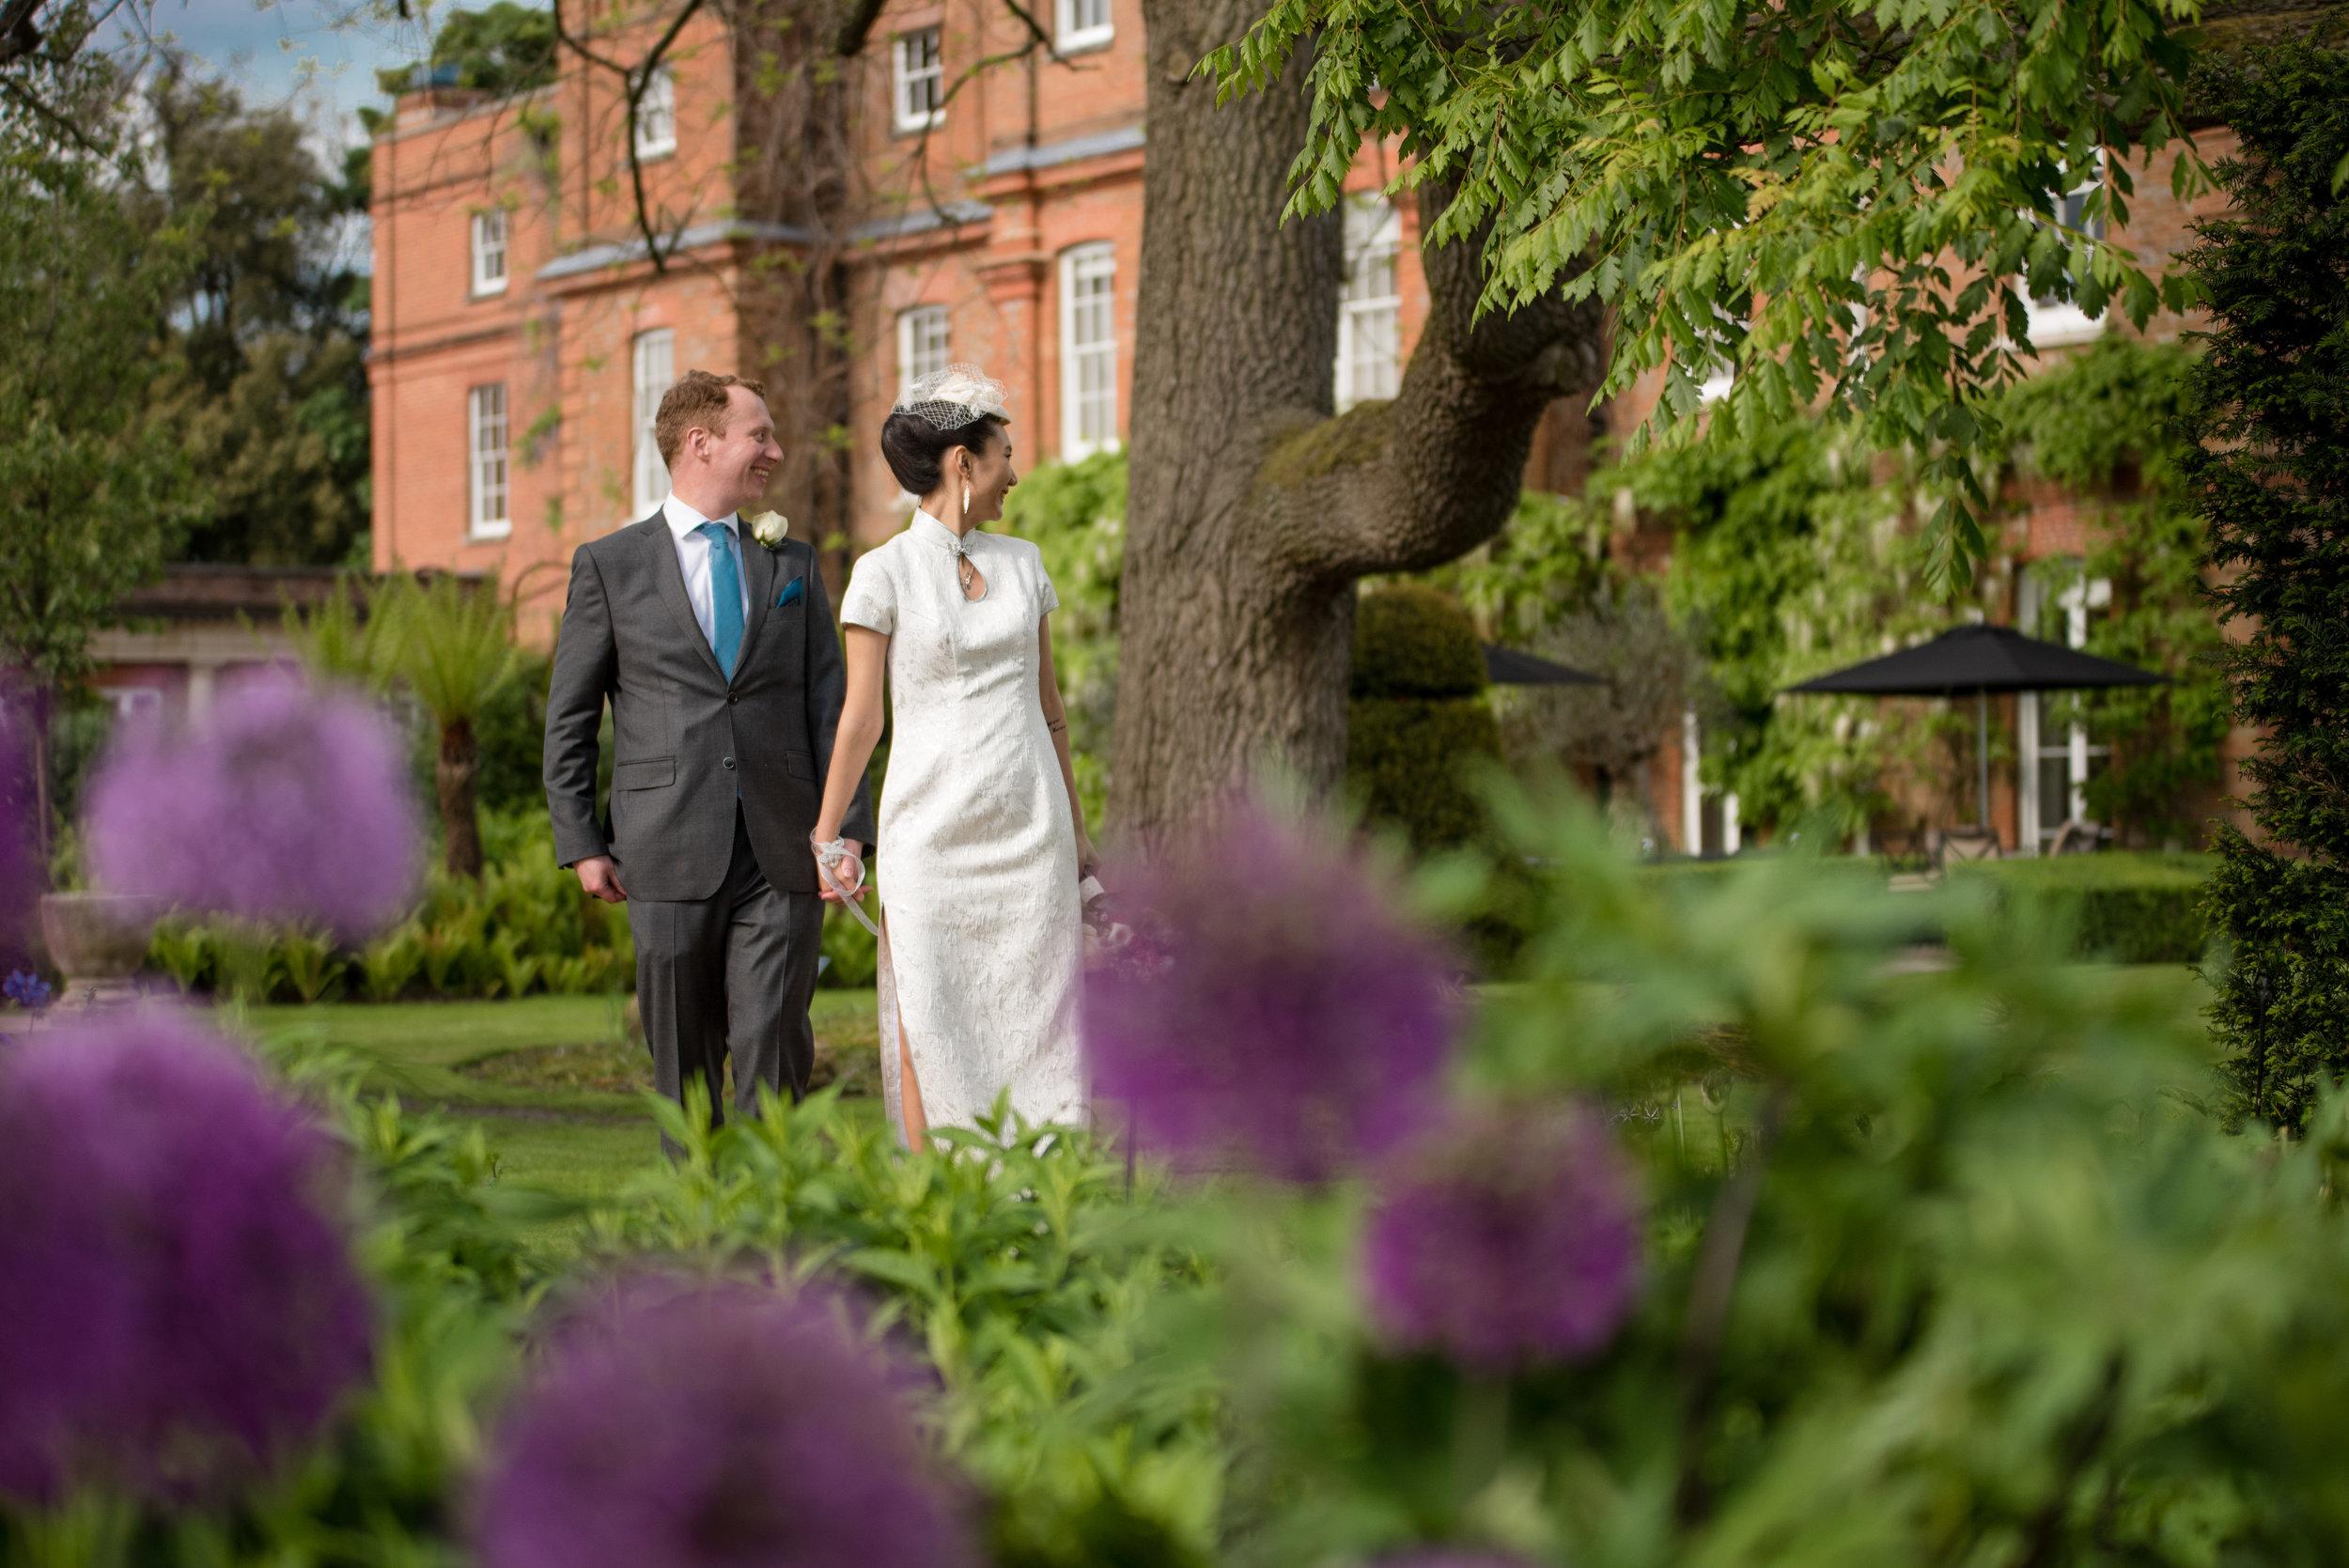 Asian wedding at The Grove Hotel Chandlers Cross Watford wedding